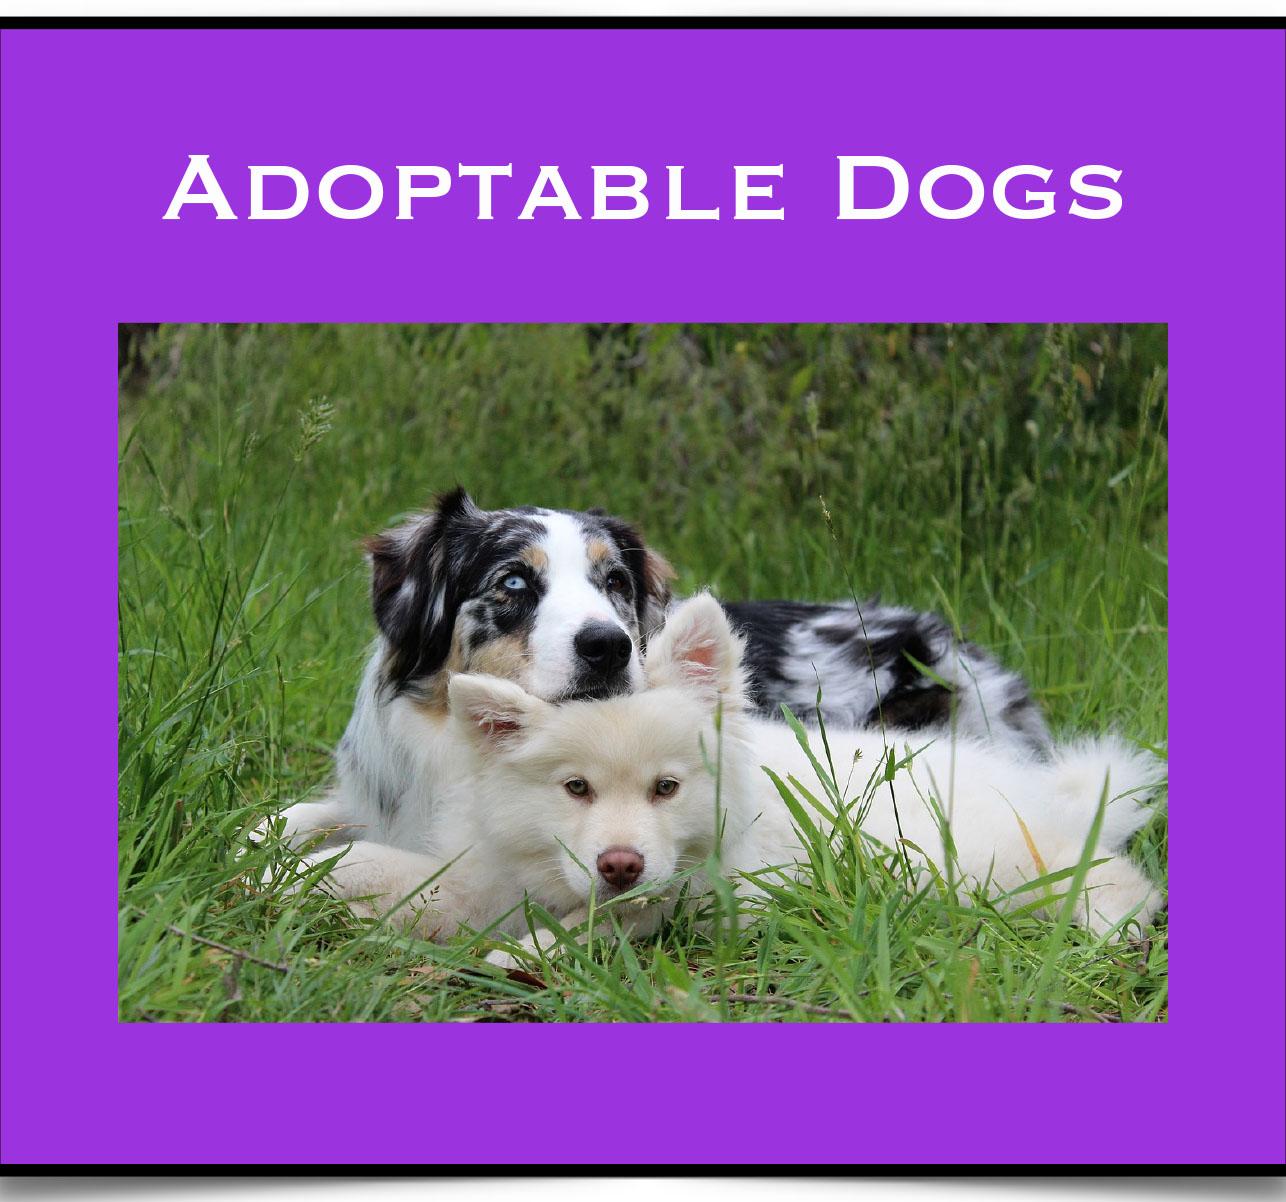 Adopt Dogs.jpg